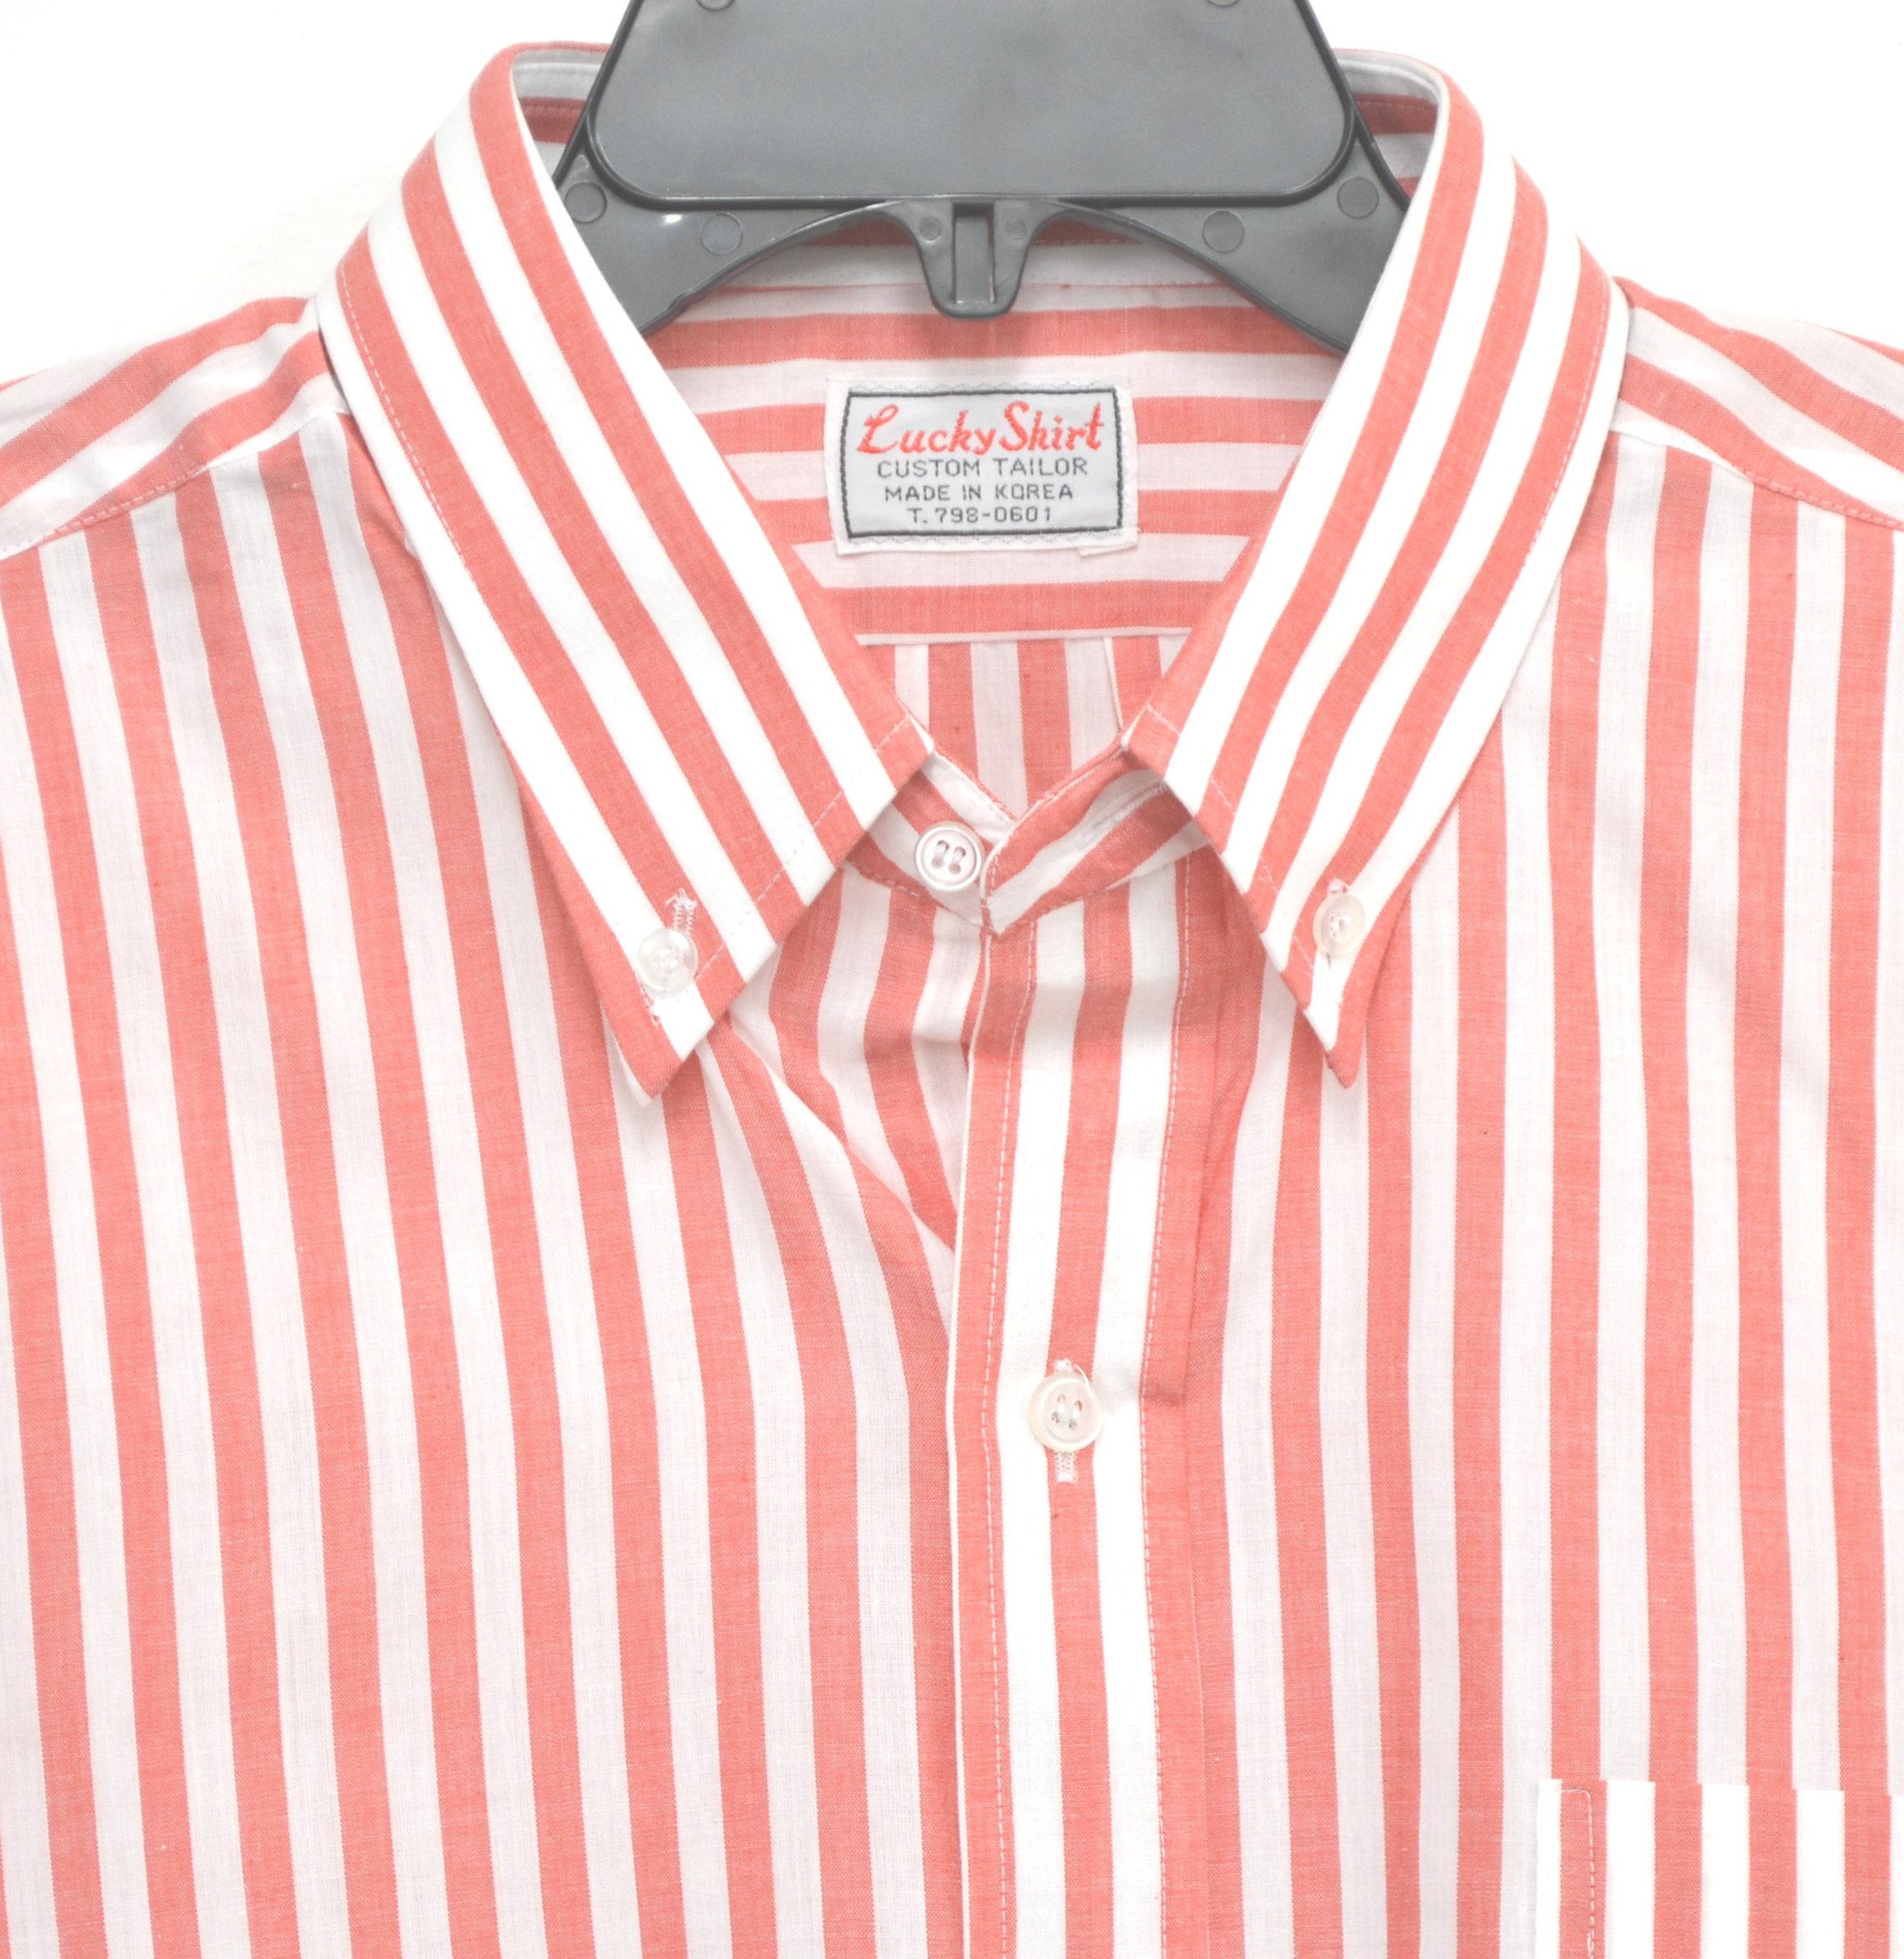 Vintage Lucky Shirt 48 Chest Custom Tailor Salmon Stripe Etsy